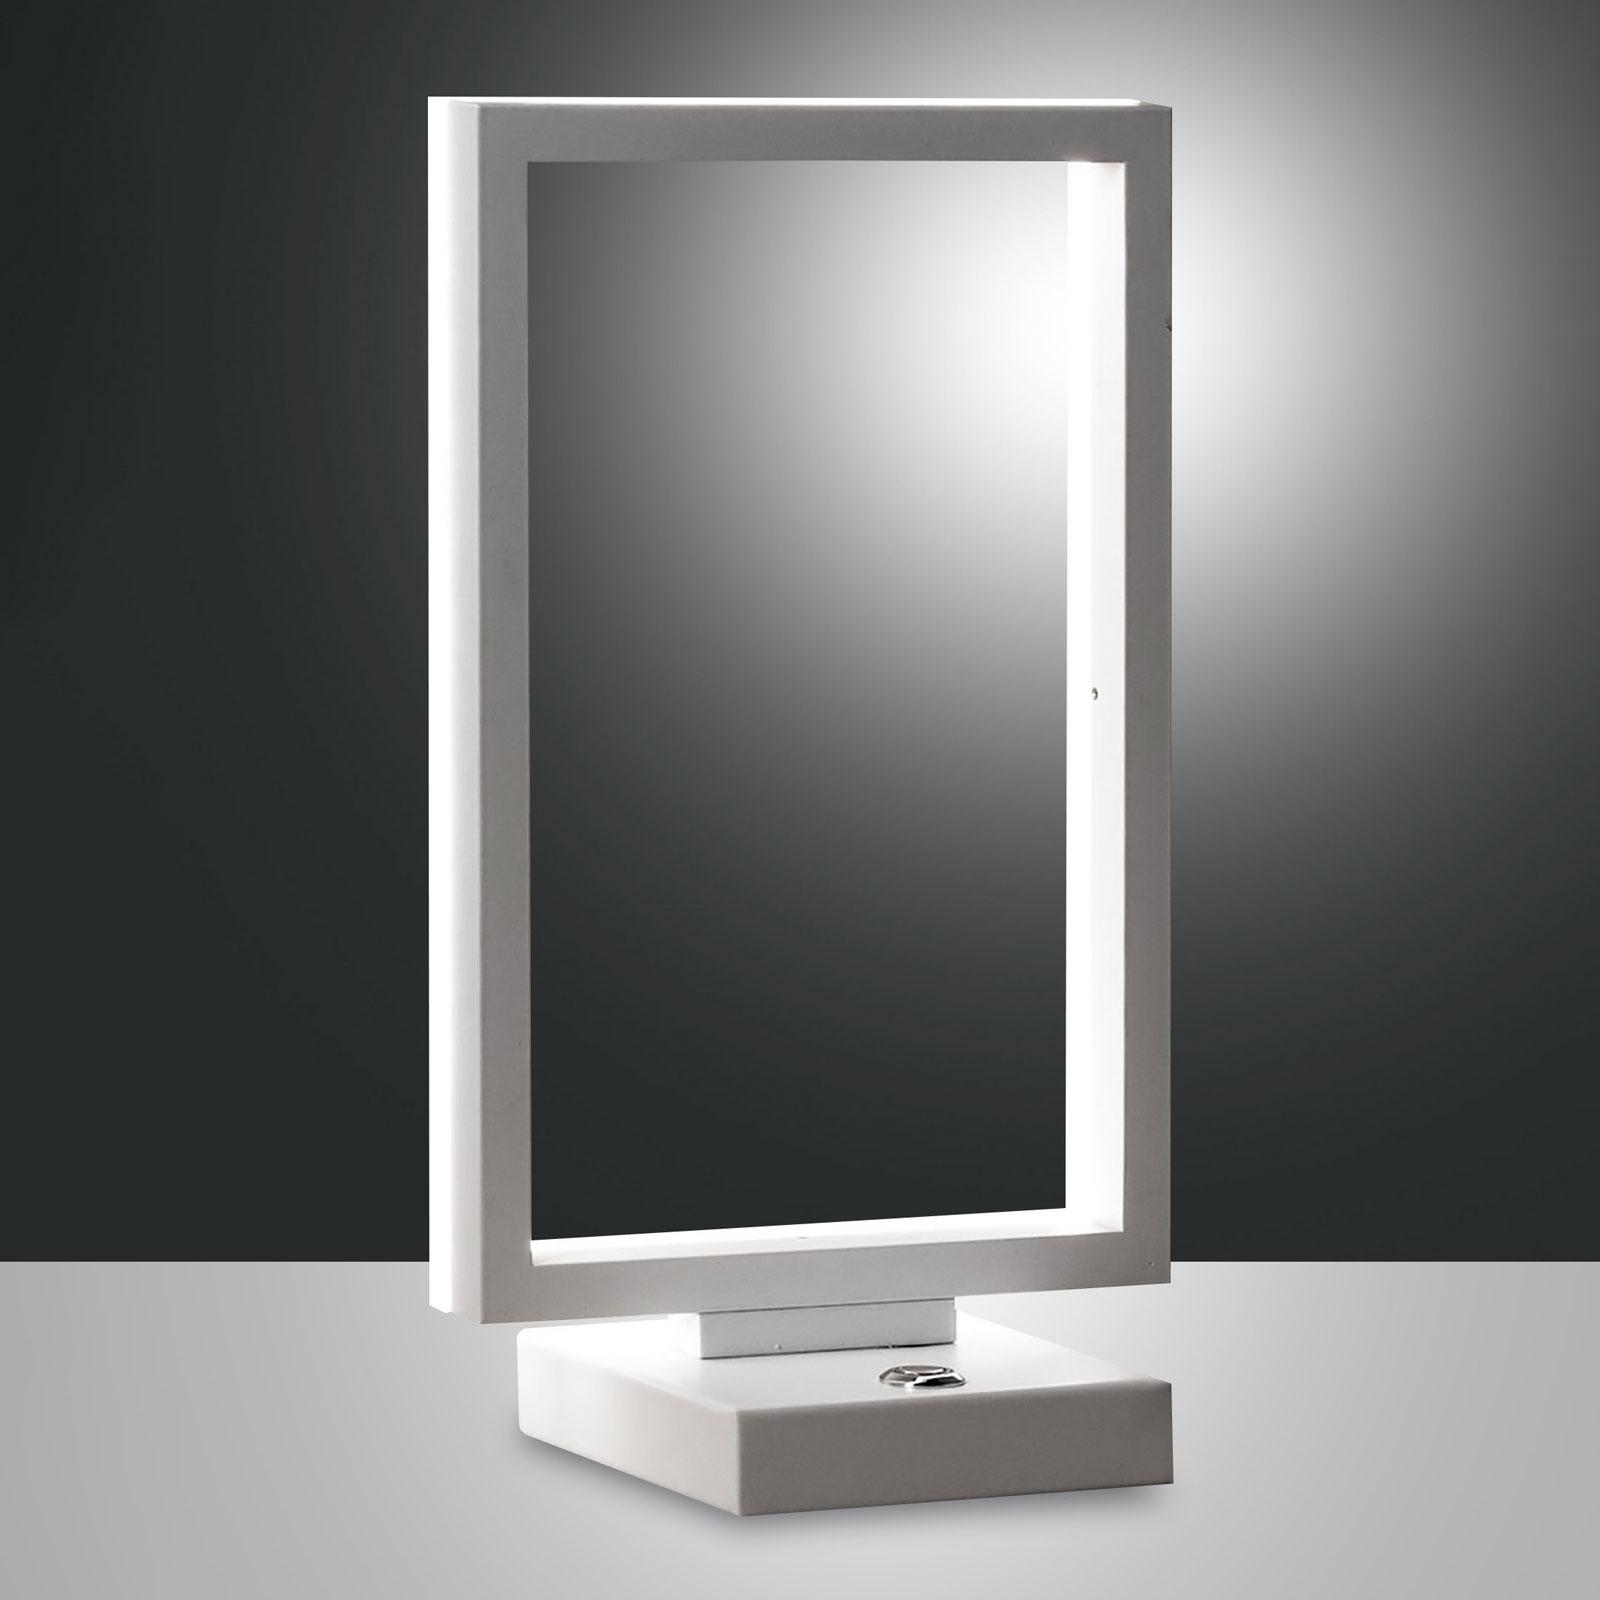 LED-bordlampe Bard, dimbar, hvit